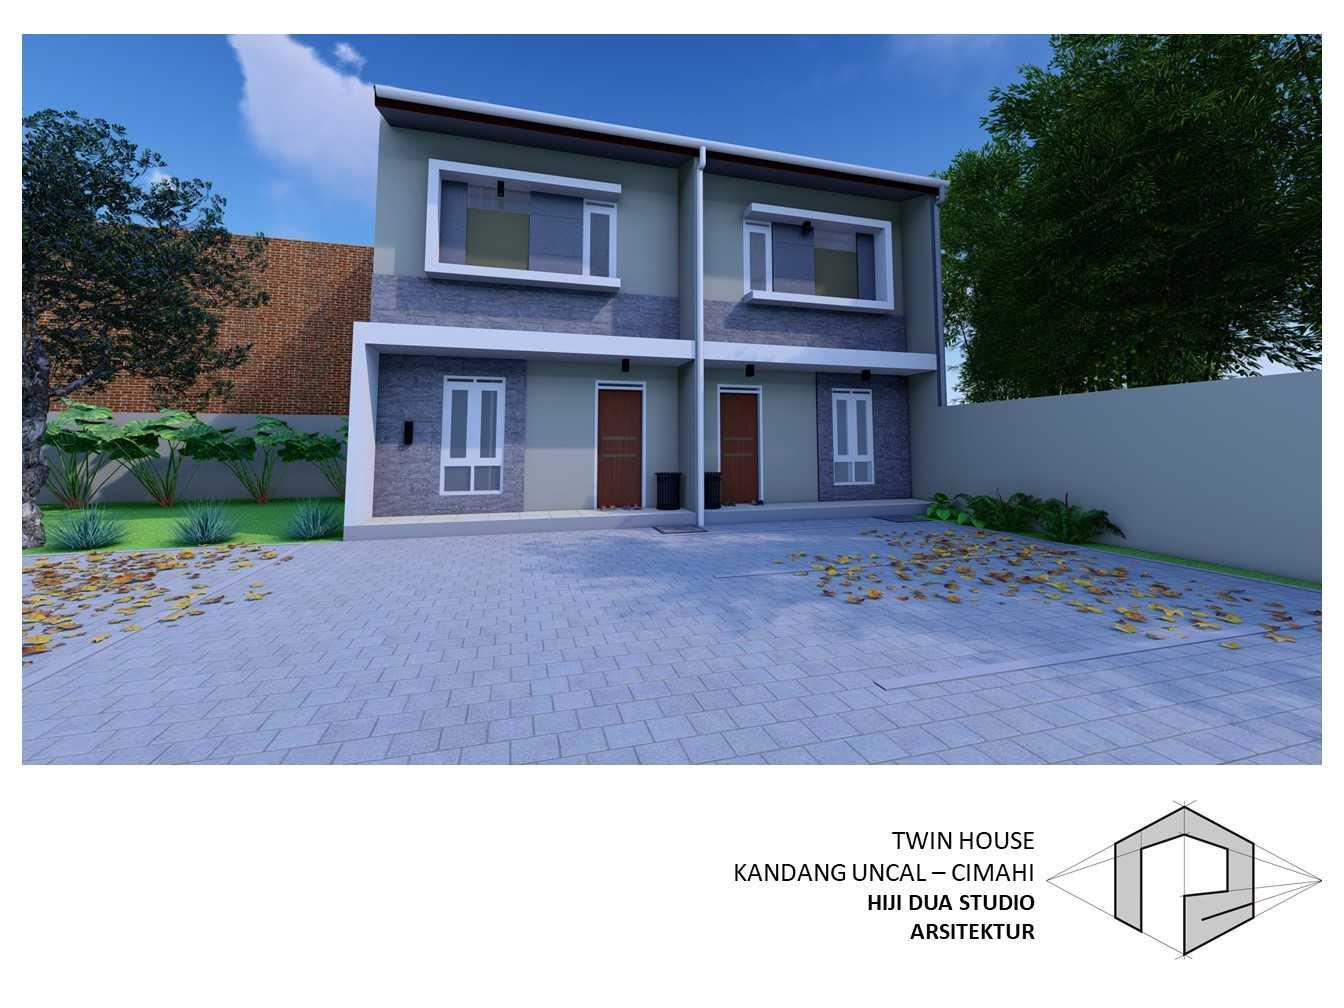 Hiji Dua Studio Arsitektur di Cimahi